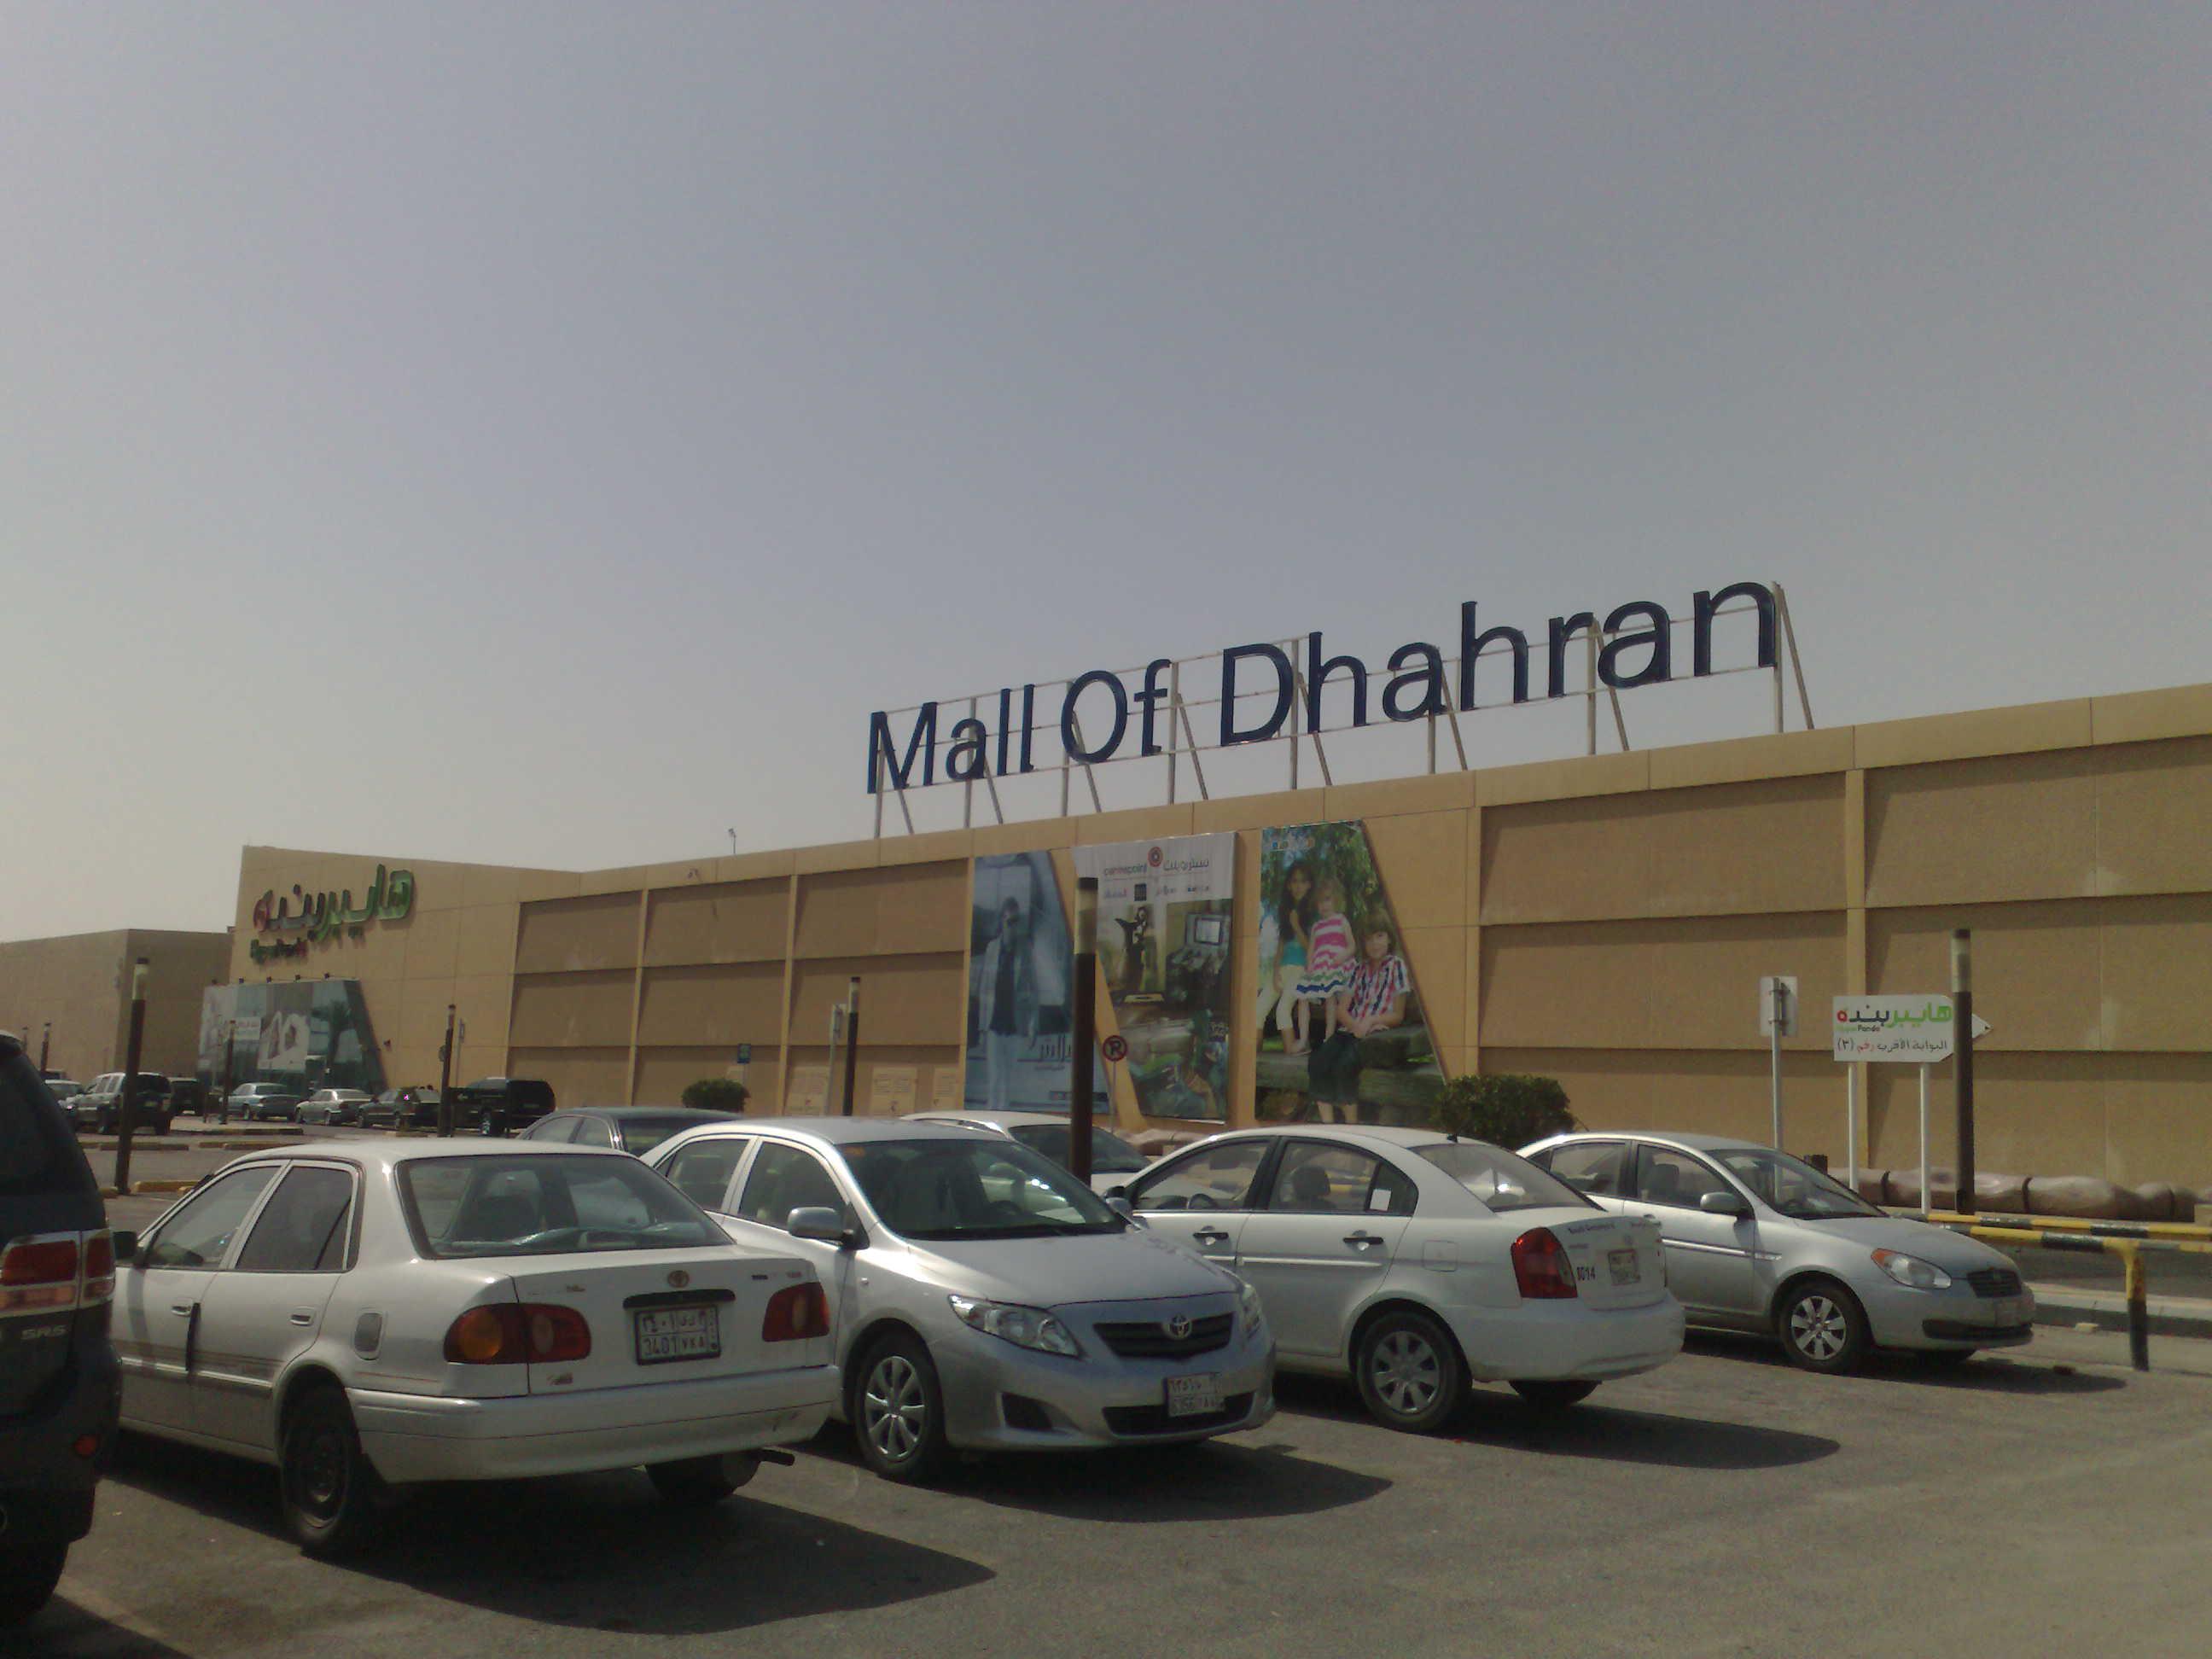 Dating dhahran